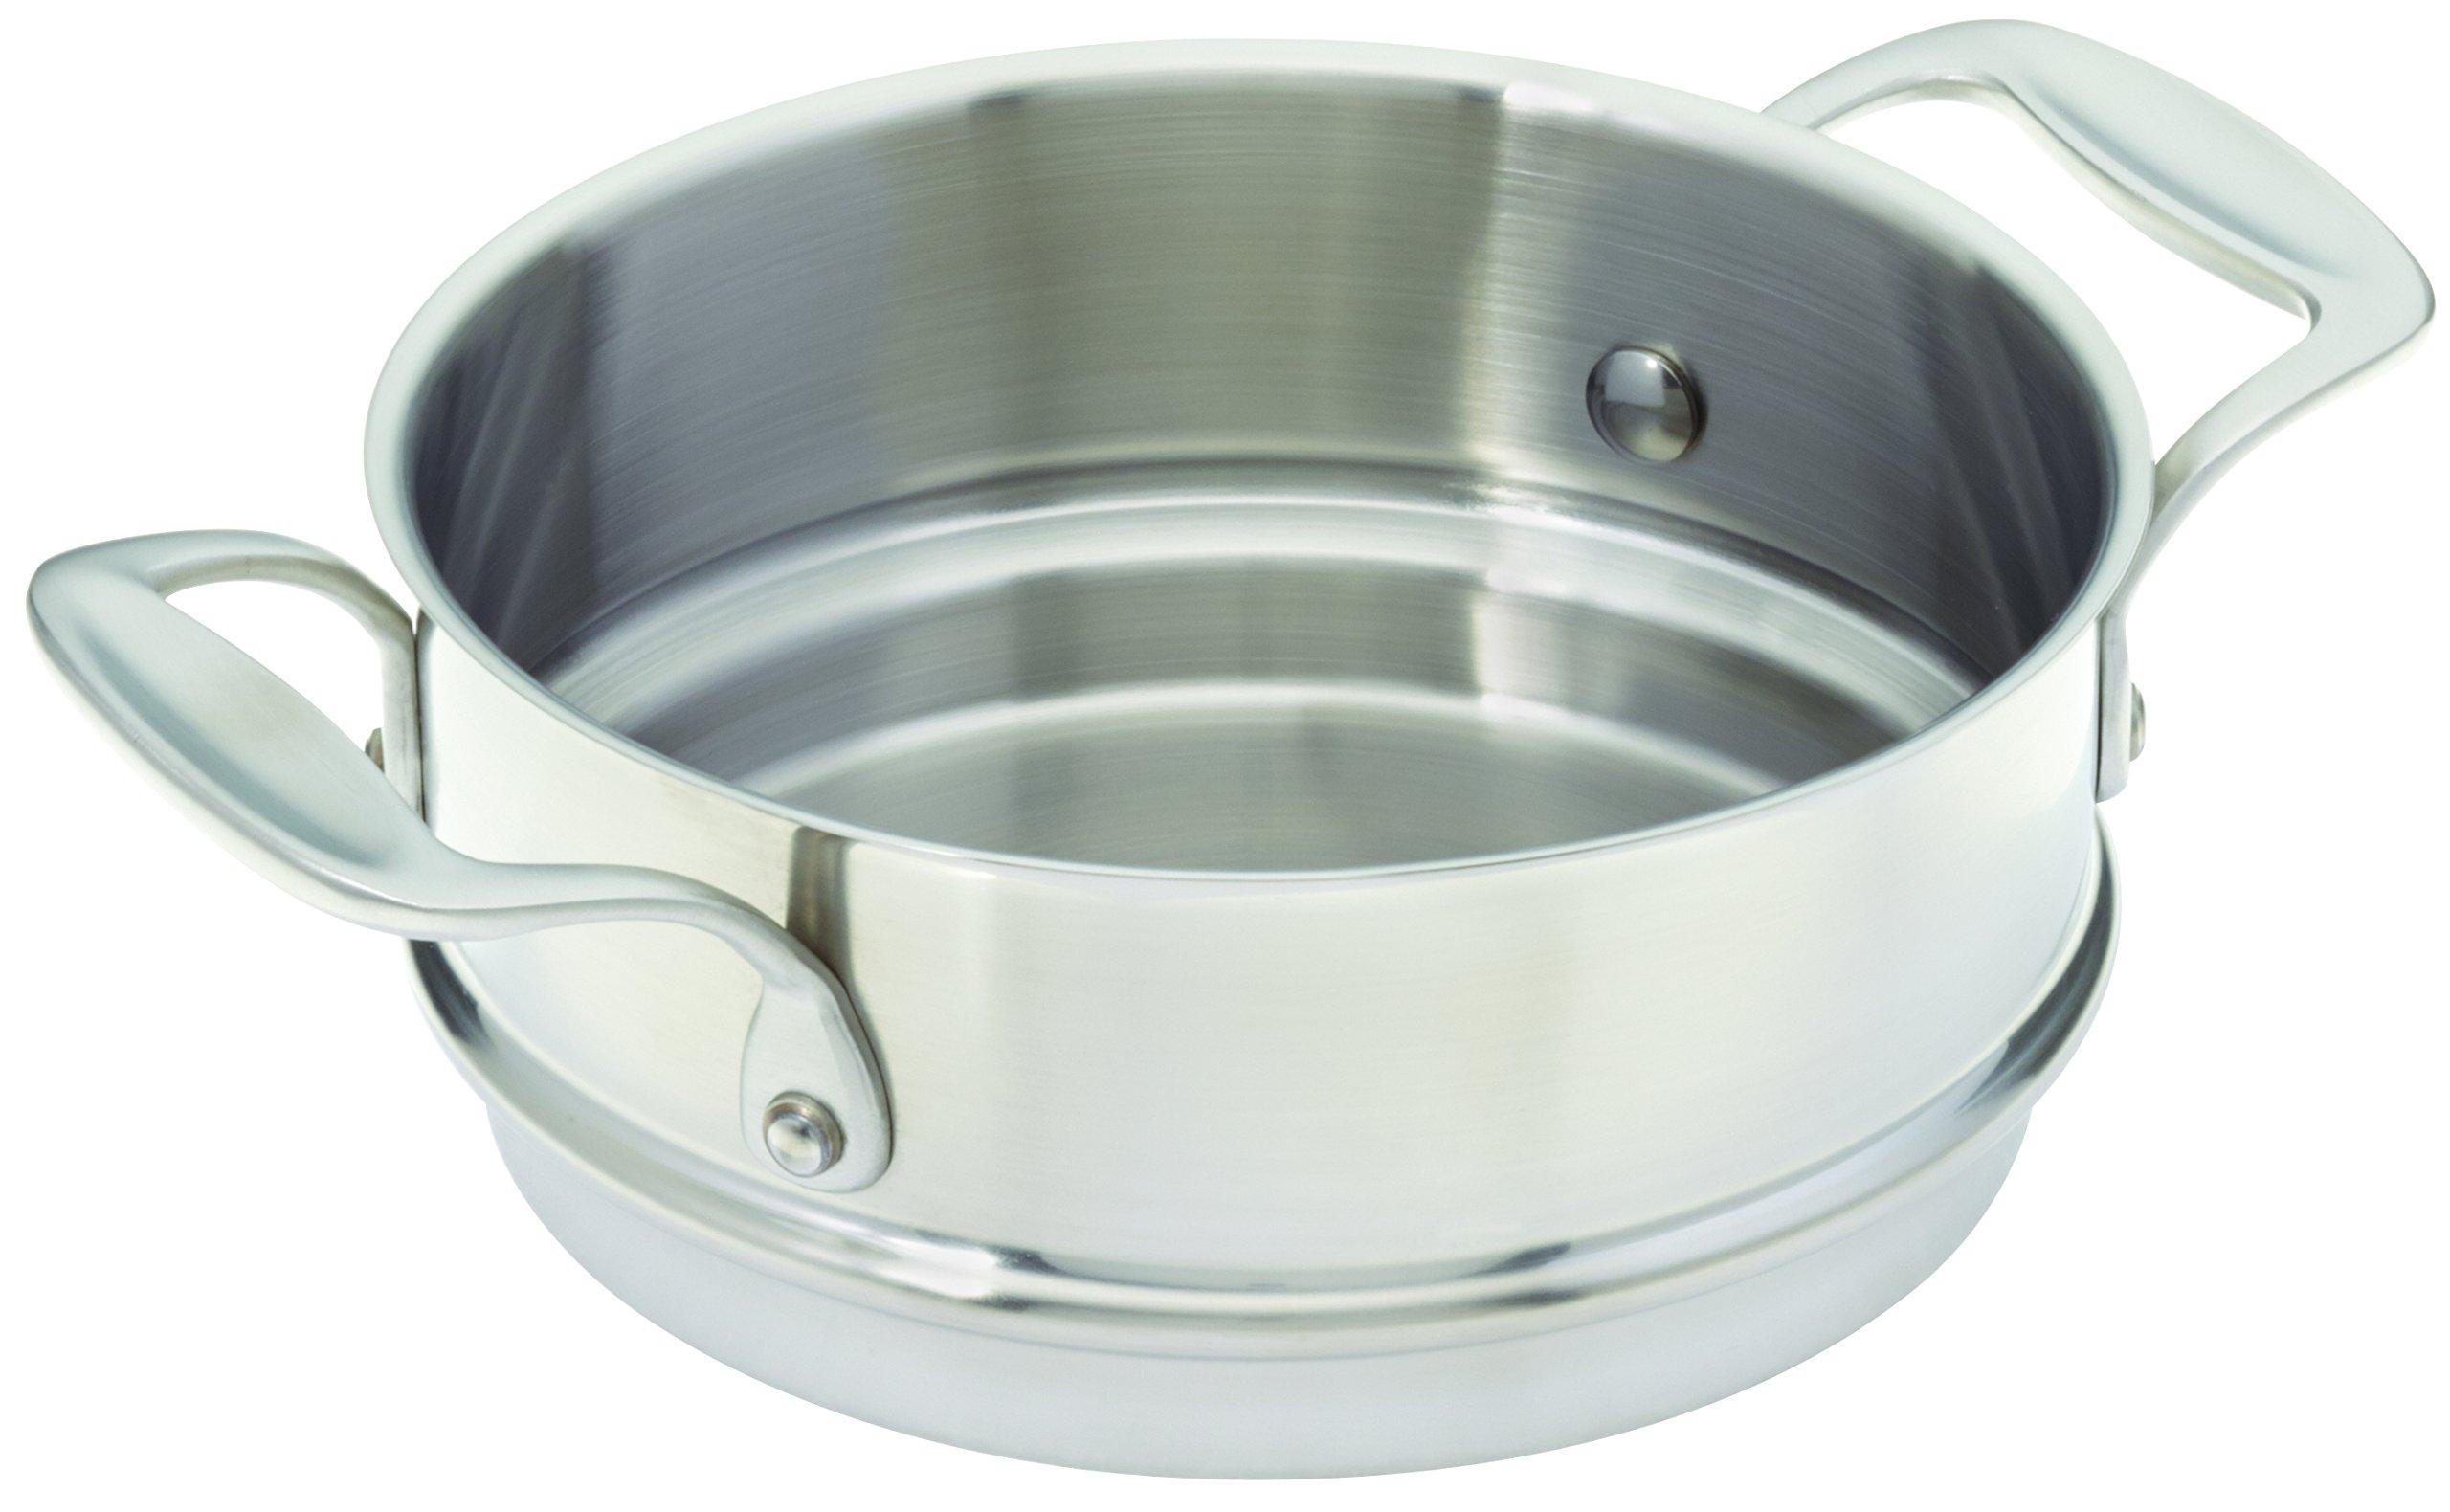 3-quart Covered Stainless Steel Double Boiler Insert (Fits 2&3 qt Saucepan)